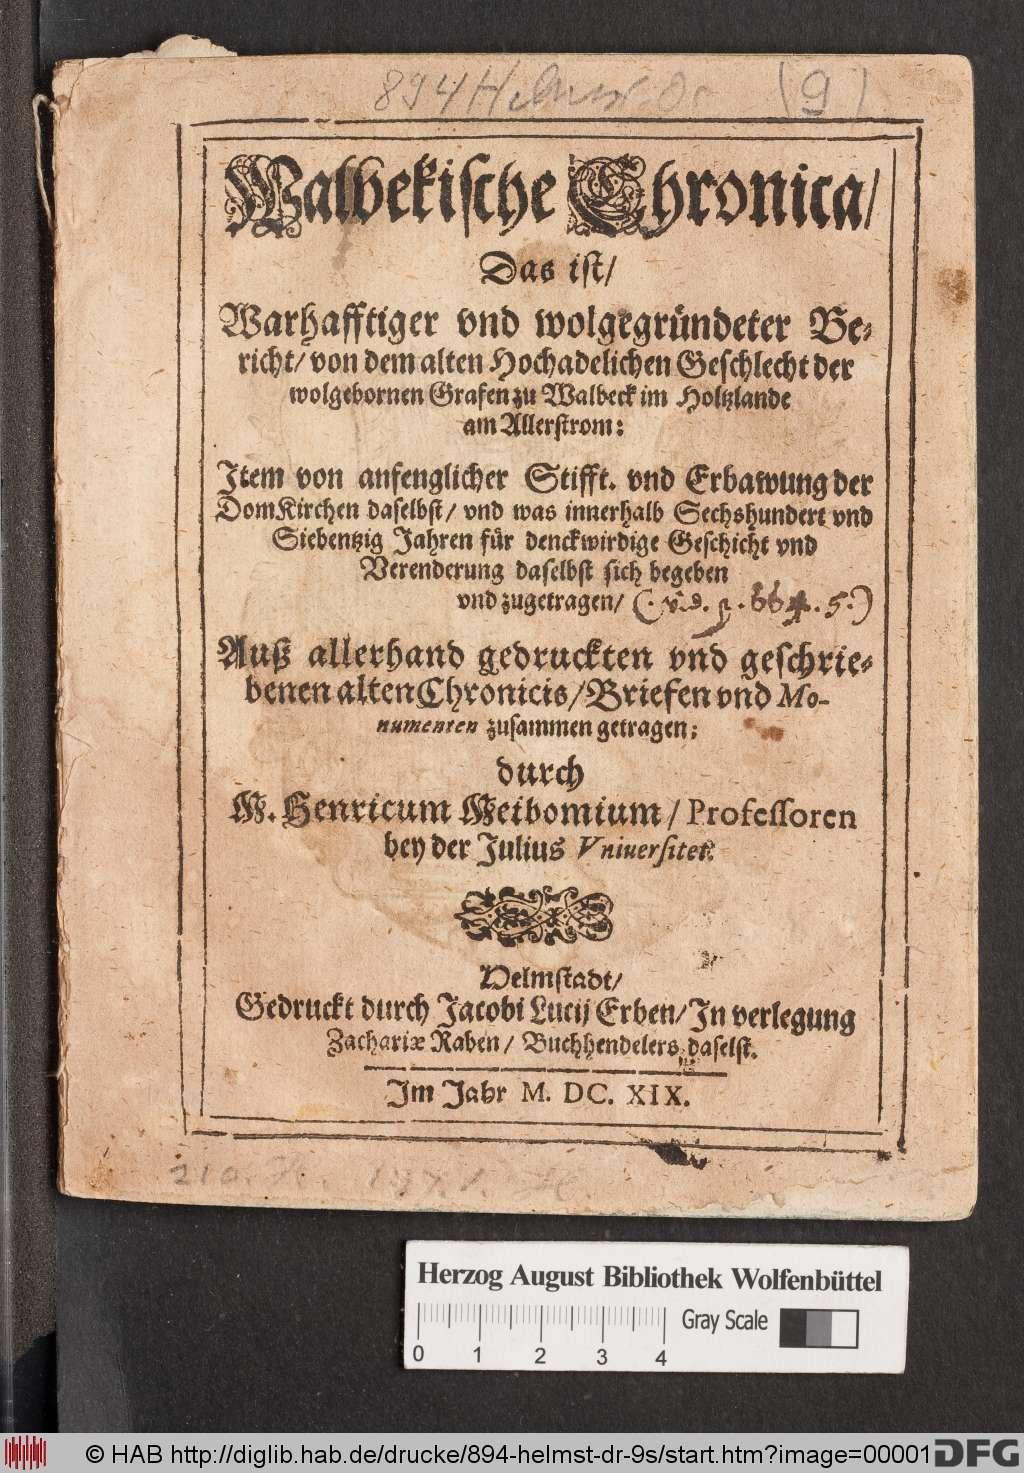 http://diglib.hab.de/drucke/894-helmst-dr-9s/00001.jpg